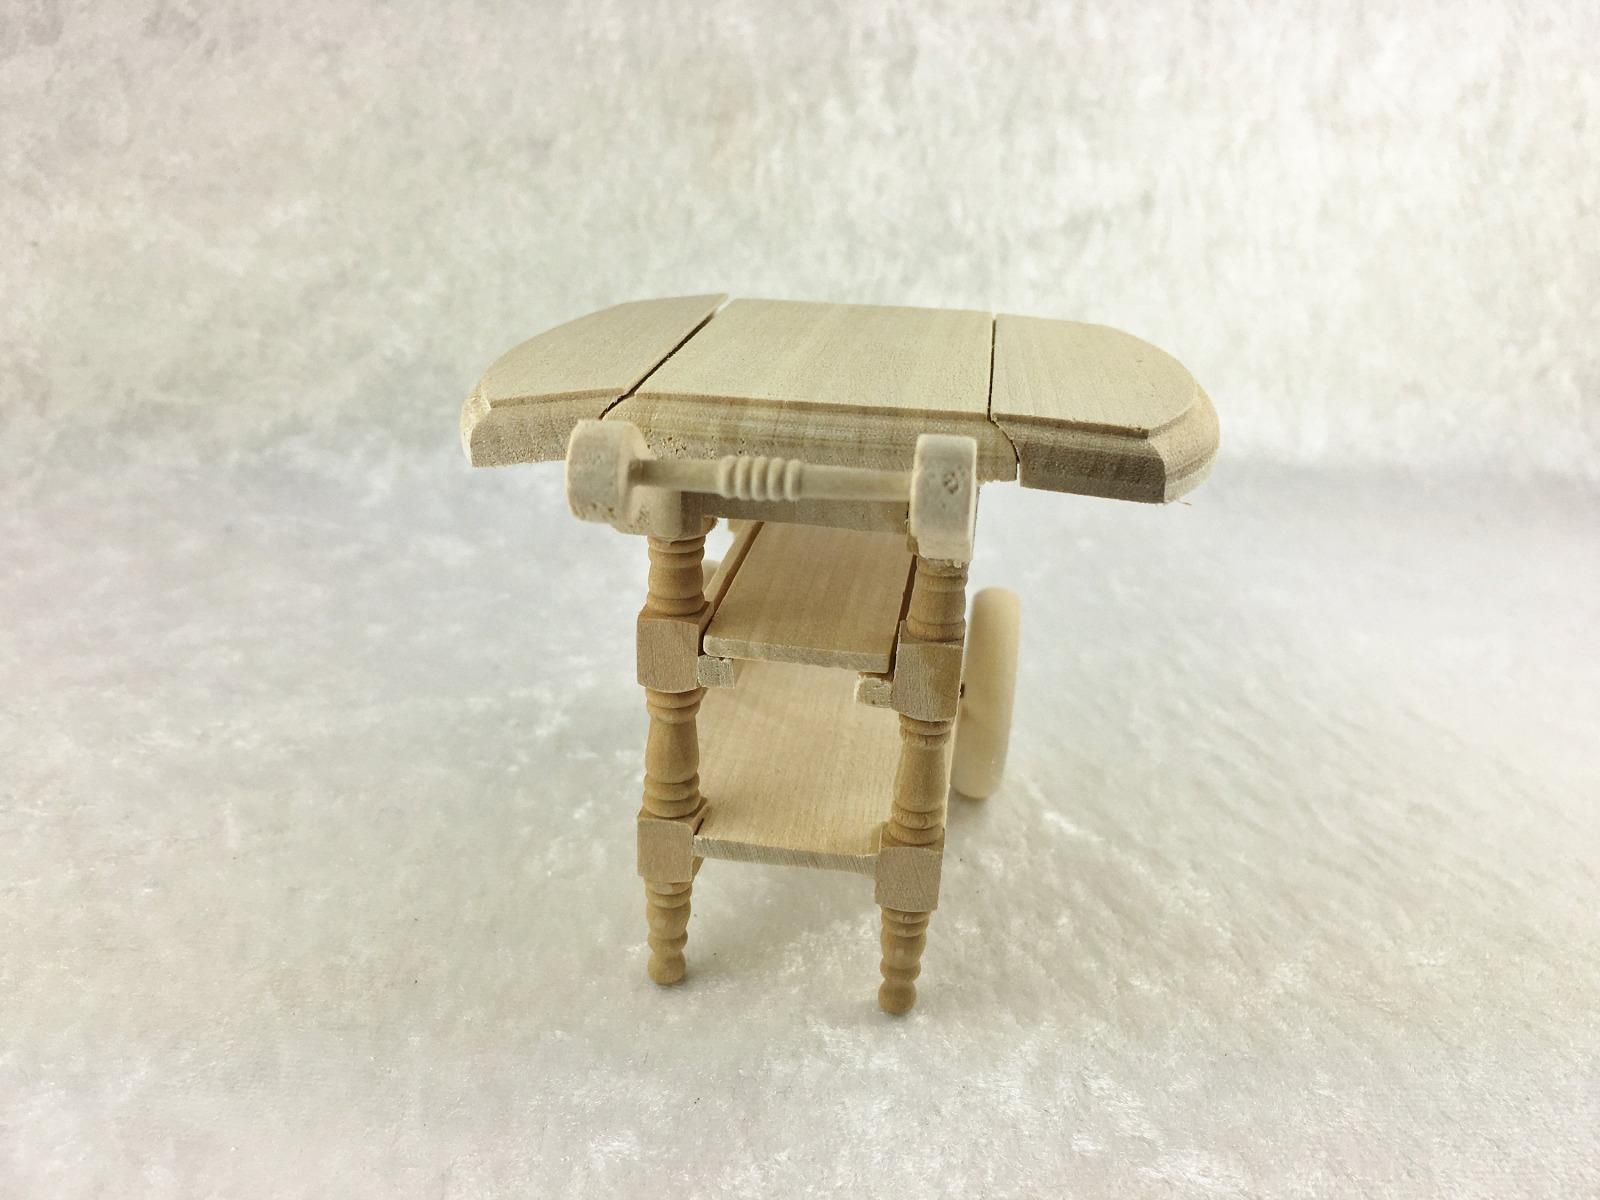 Teewagen 1:12 Miniatur 4